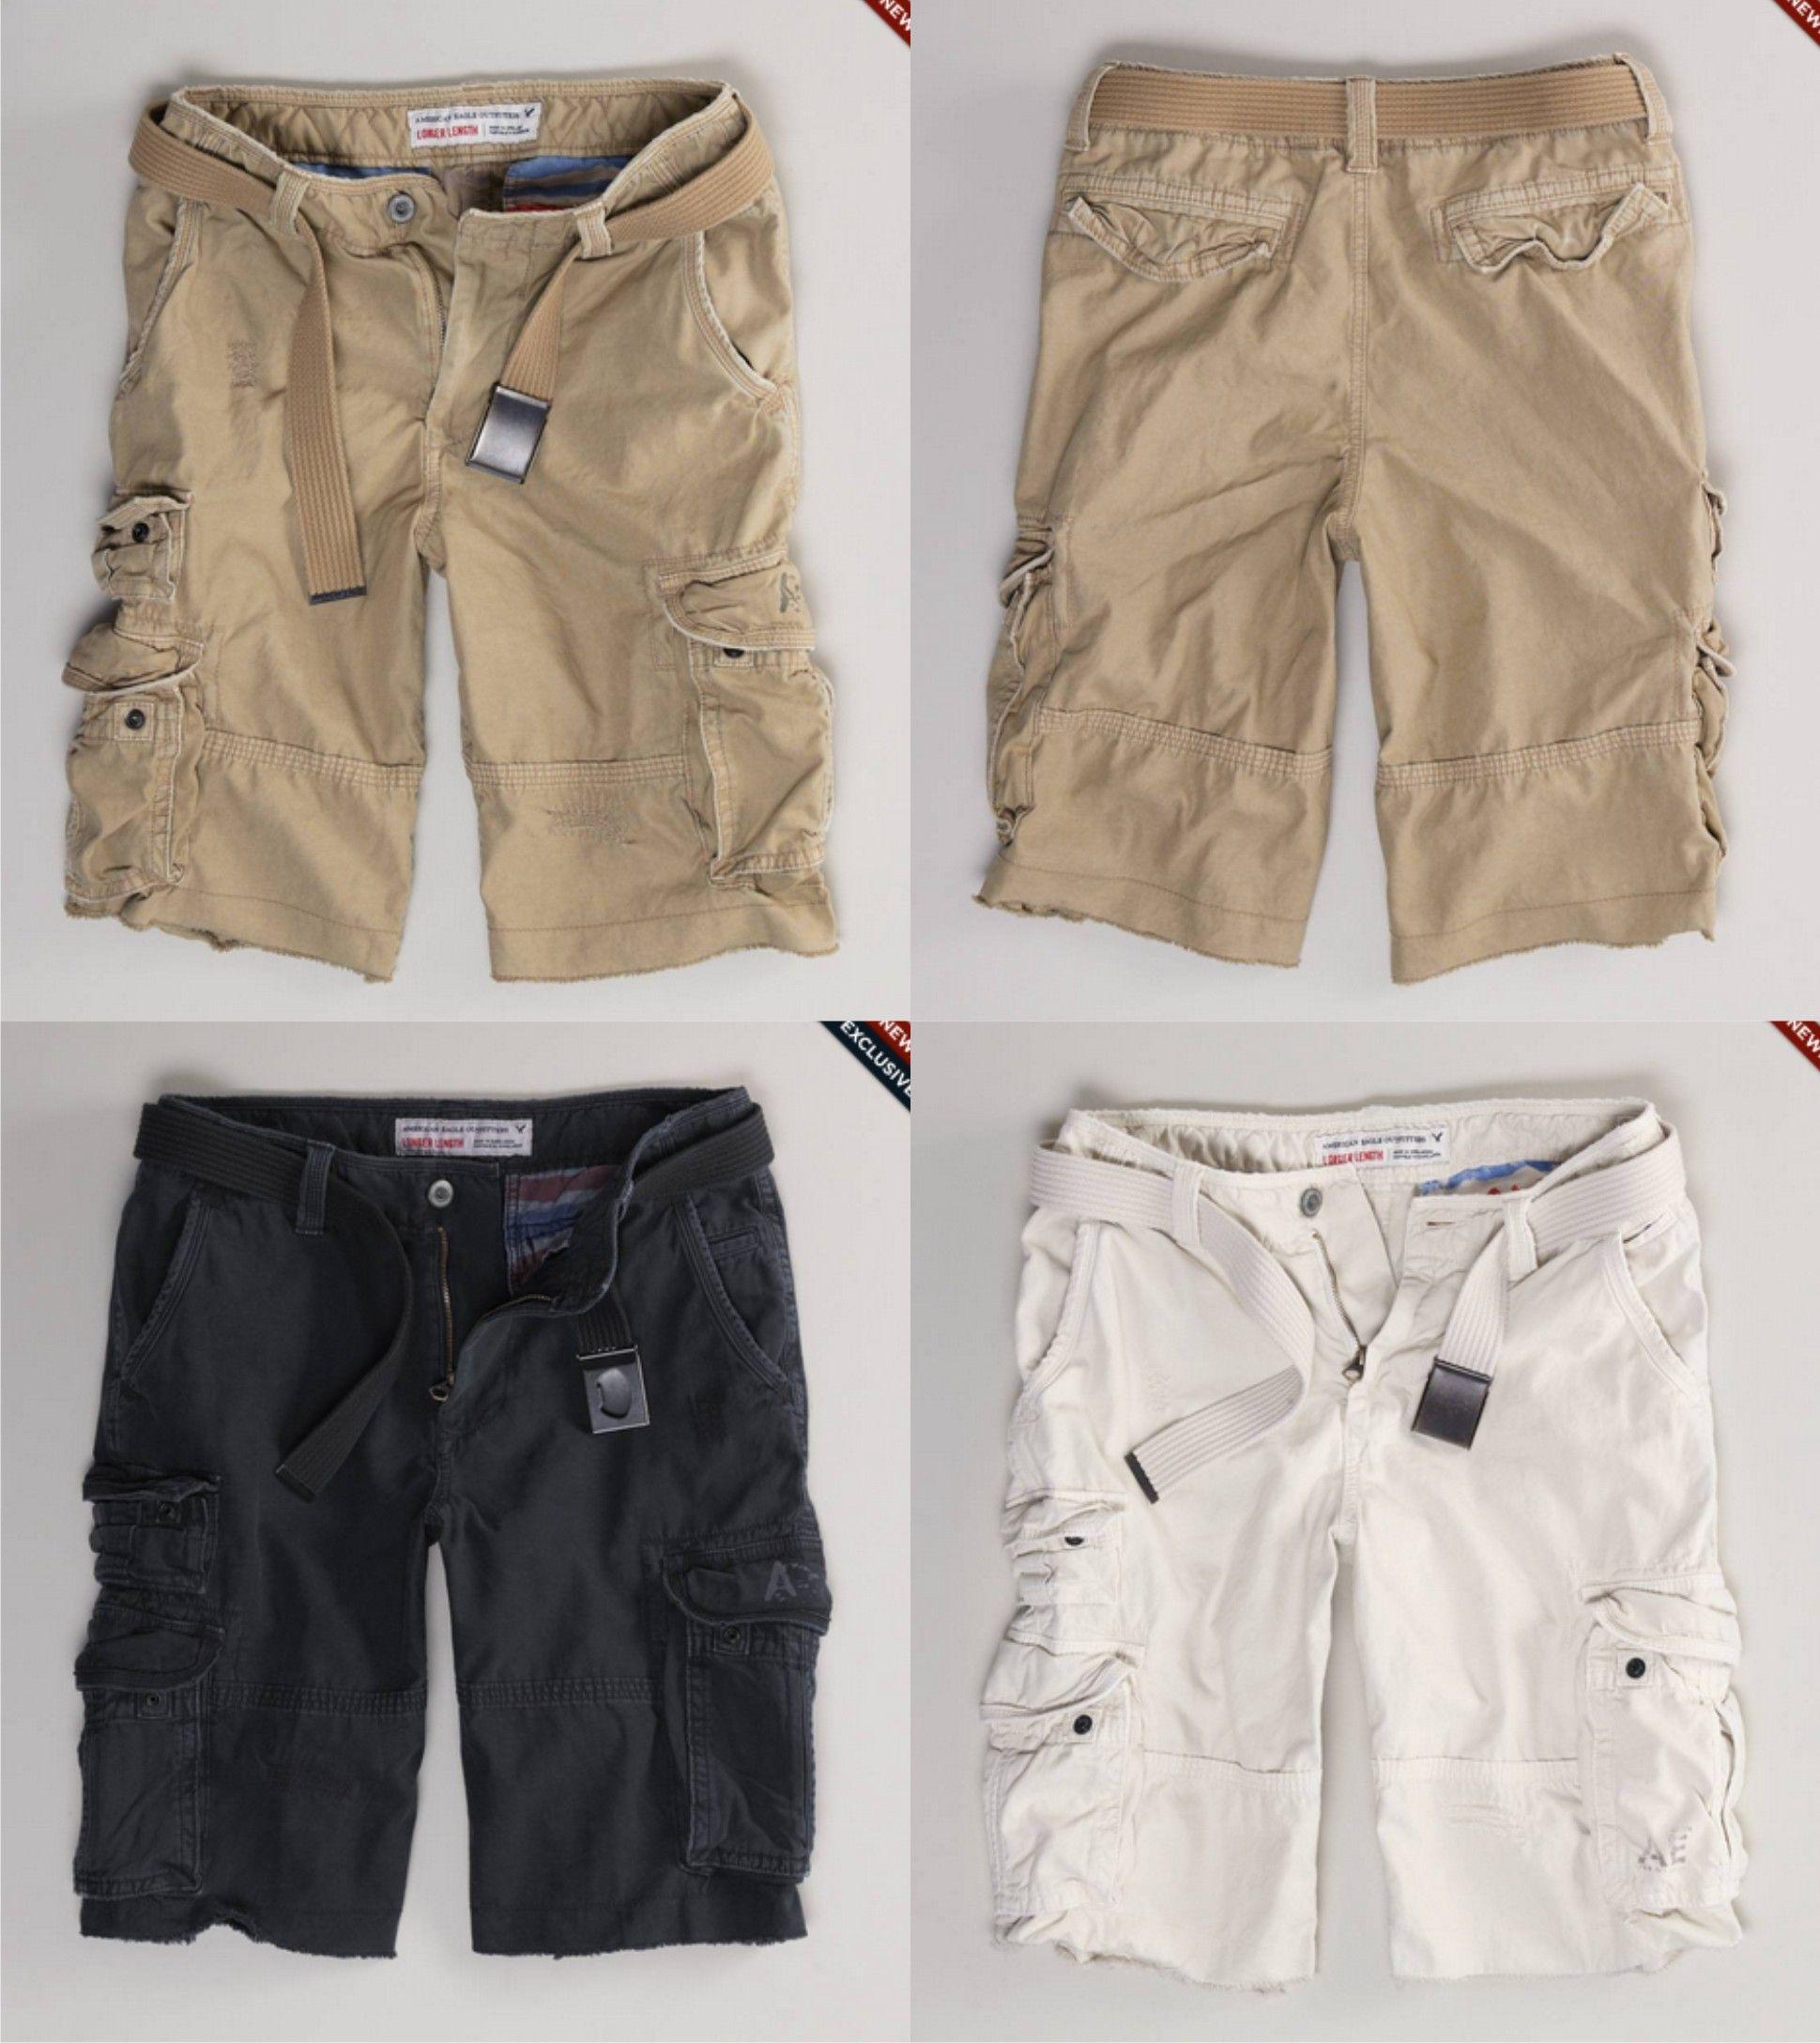 American eagle shorts sexi pinterest bermudas - Ropa sexi masculina ...